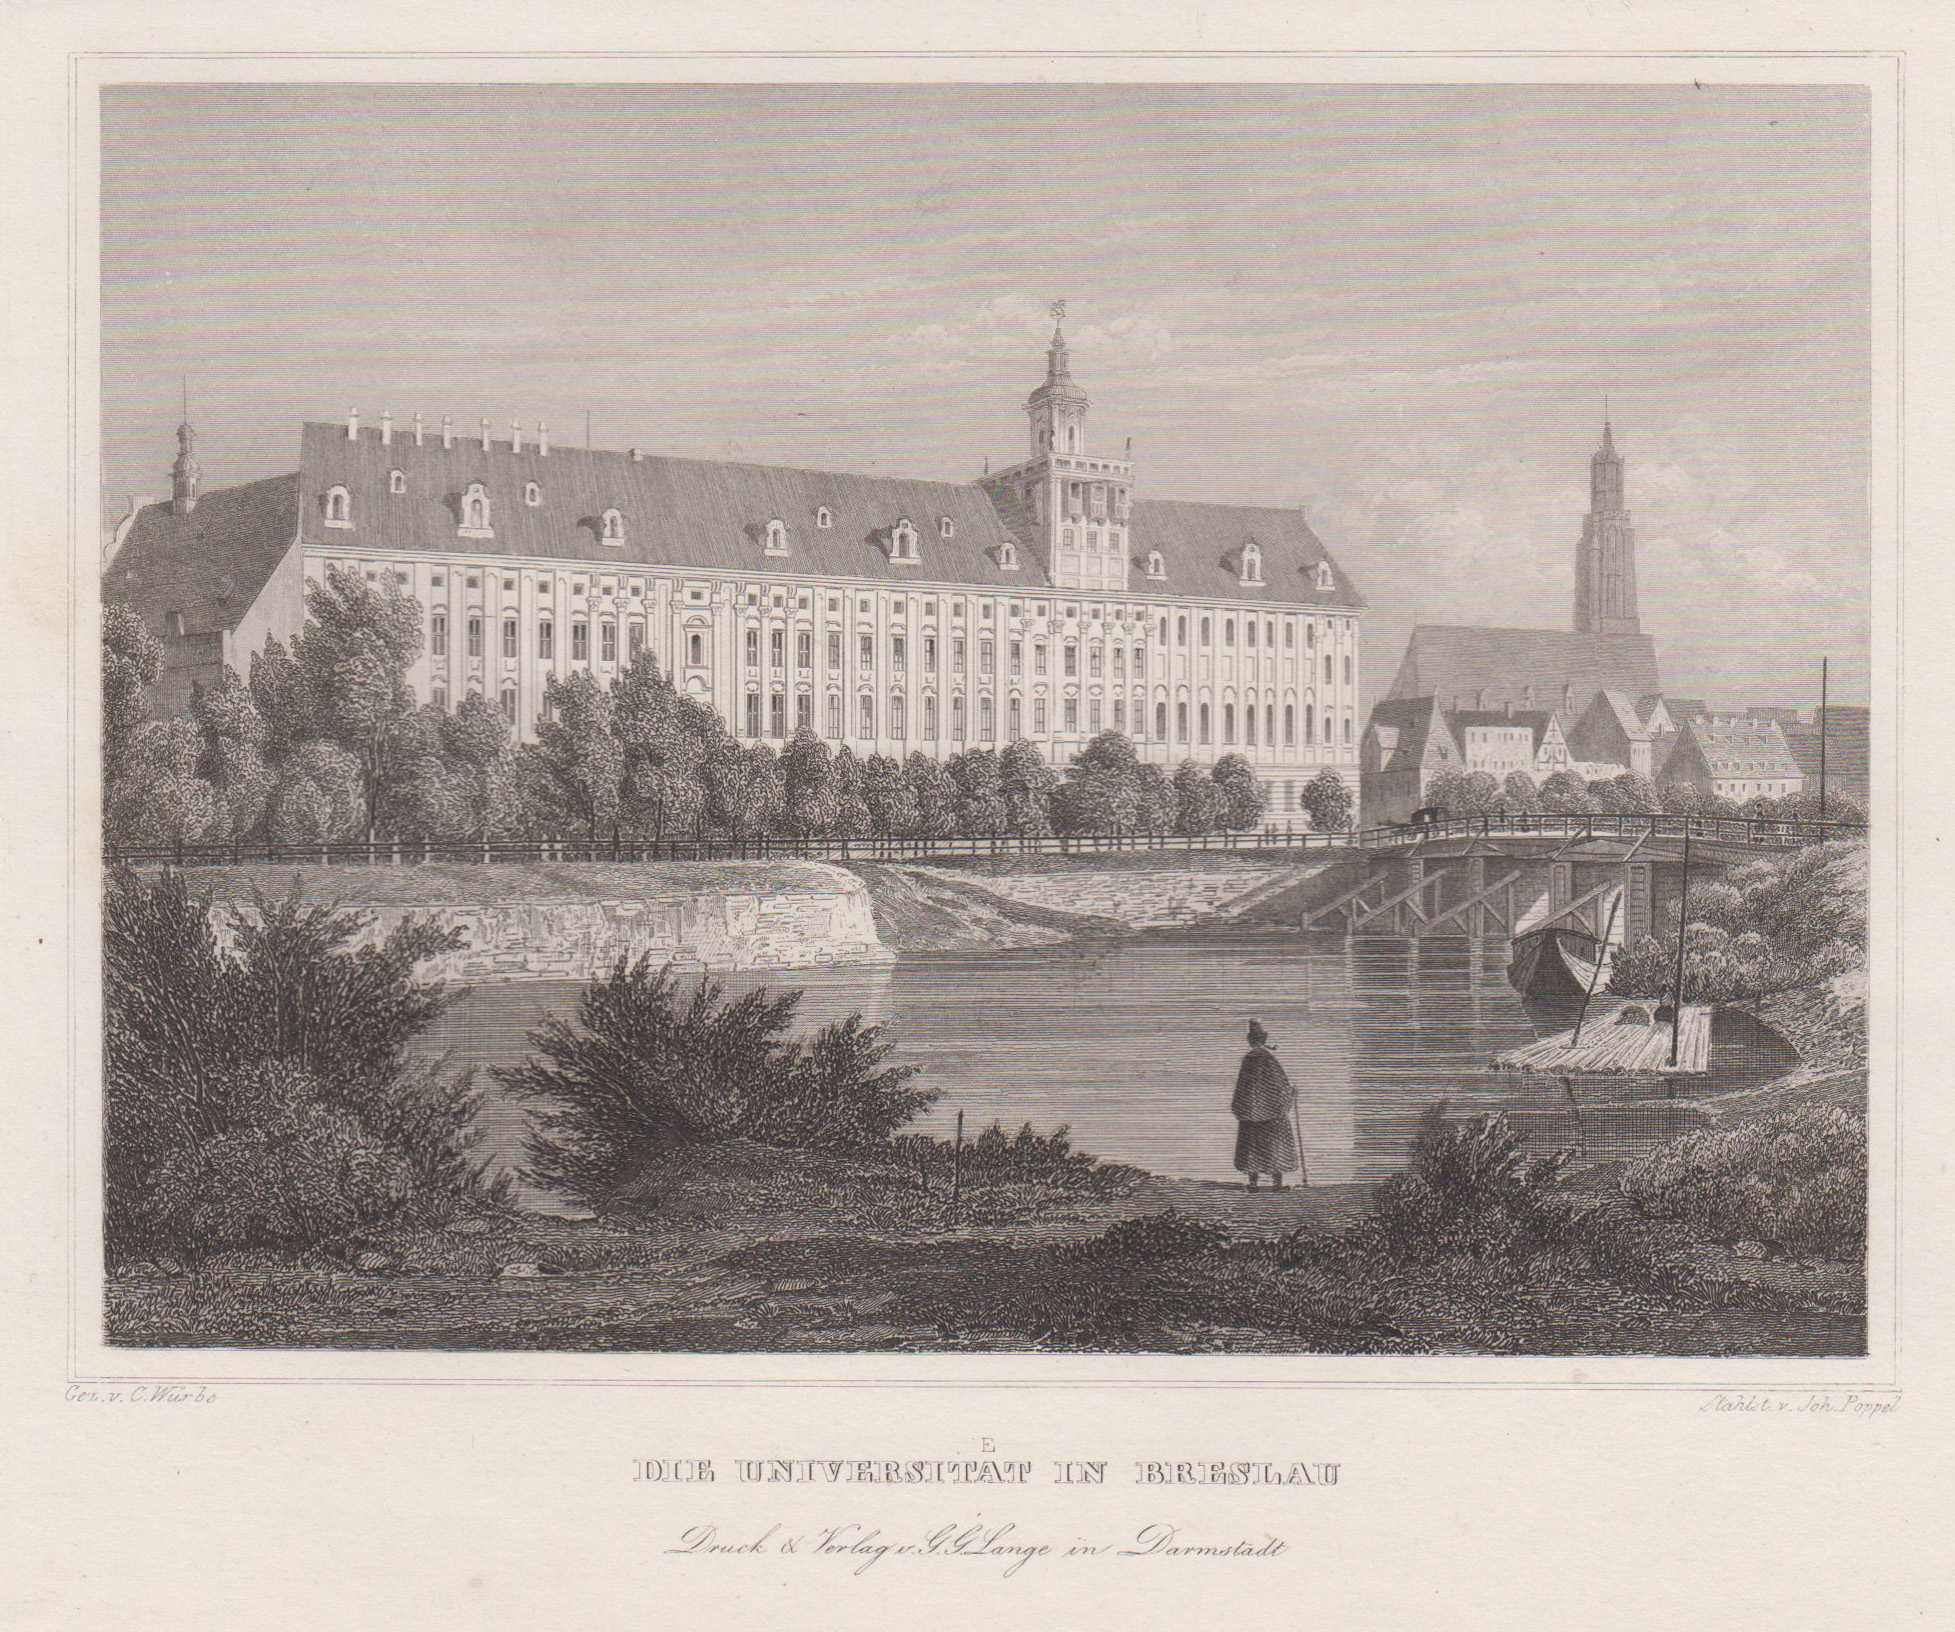 TA., Universität.: Breslau ( Wroclaw